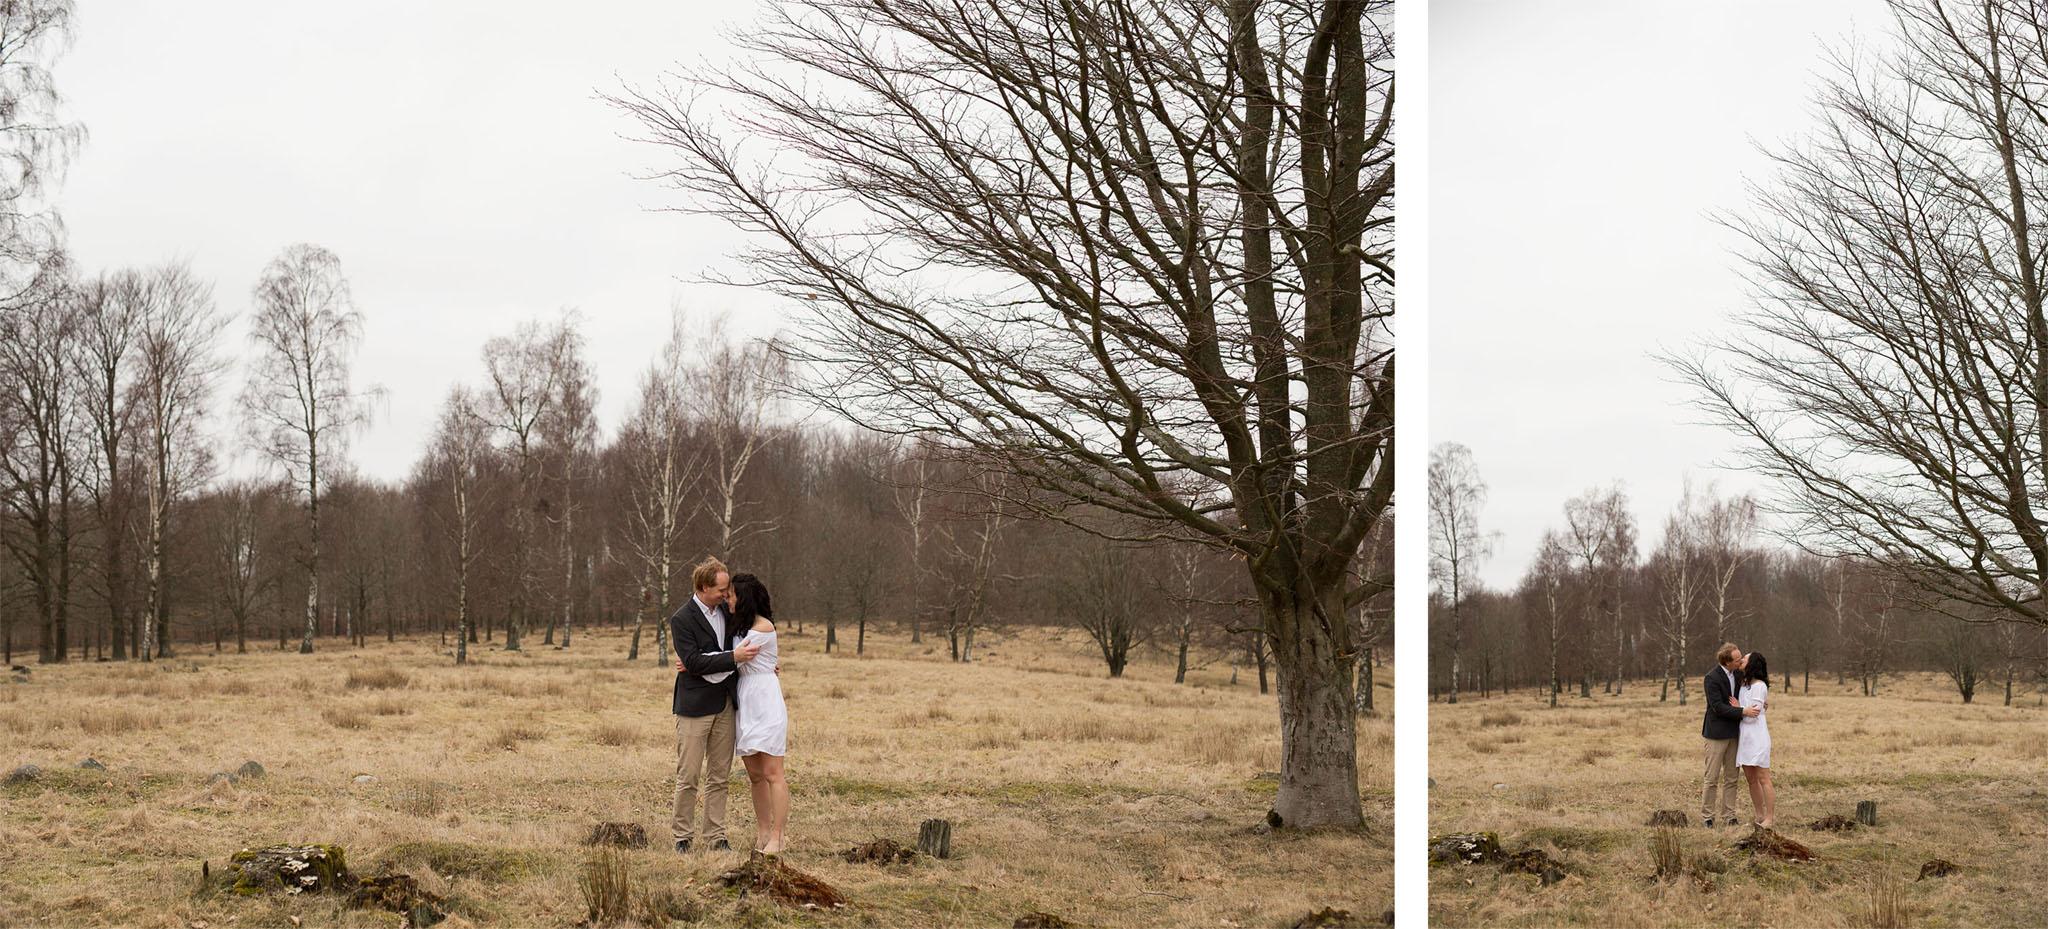 fotograf_sabina_wixner_hudiksvall_2.jpg